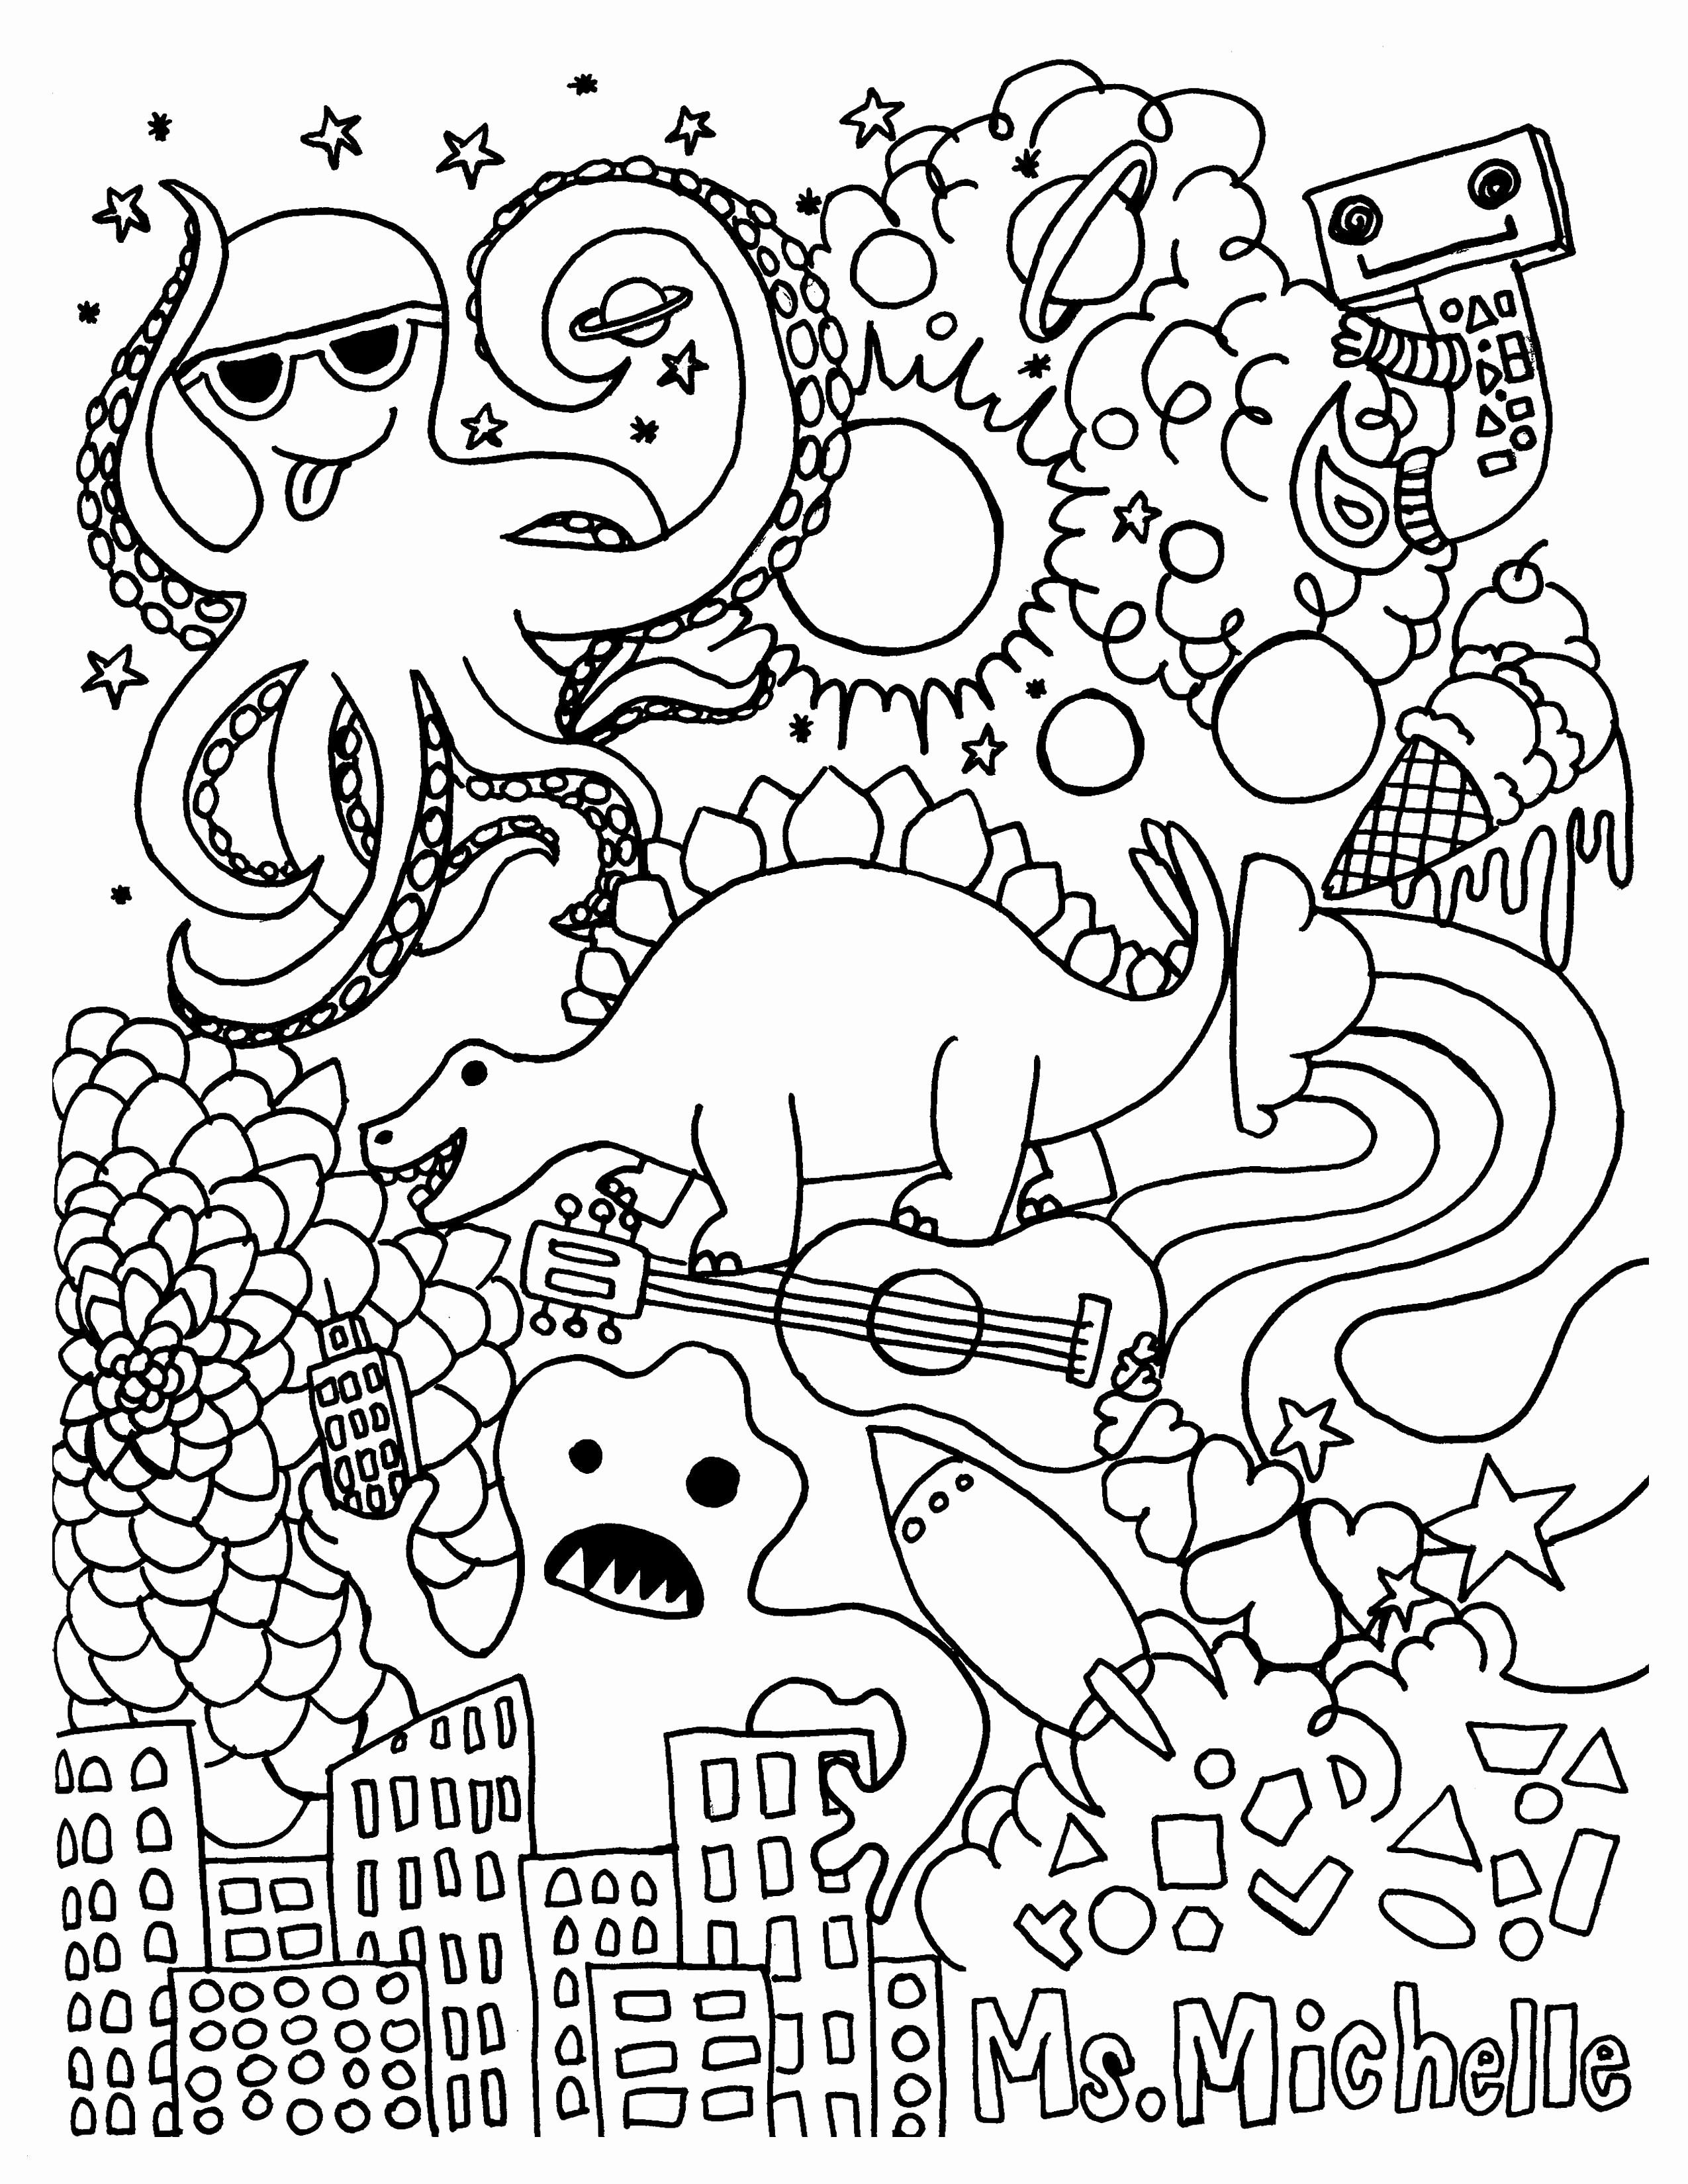 Graffiti Ausmalbilder Namen Inspirierend Coloring Pages Graffiti Mason Beautiful 40 Graffiti Ausmalbilder Bilder